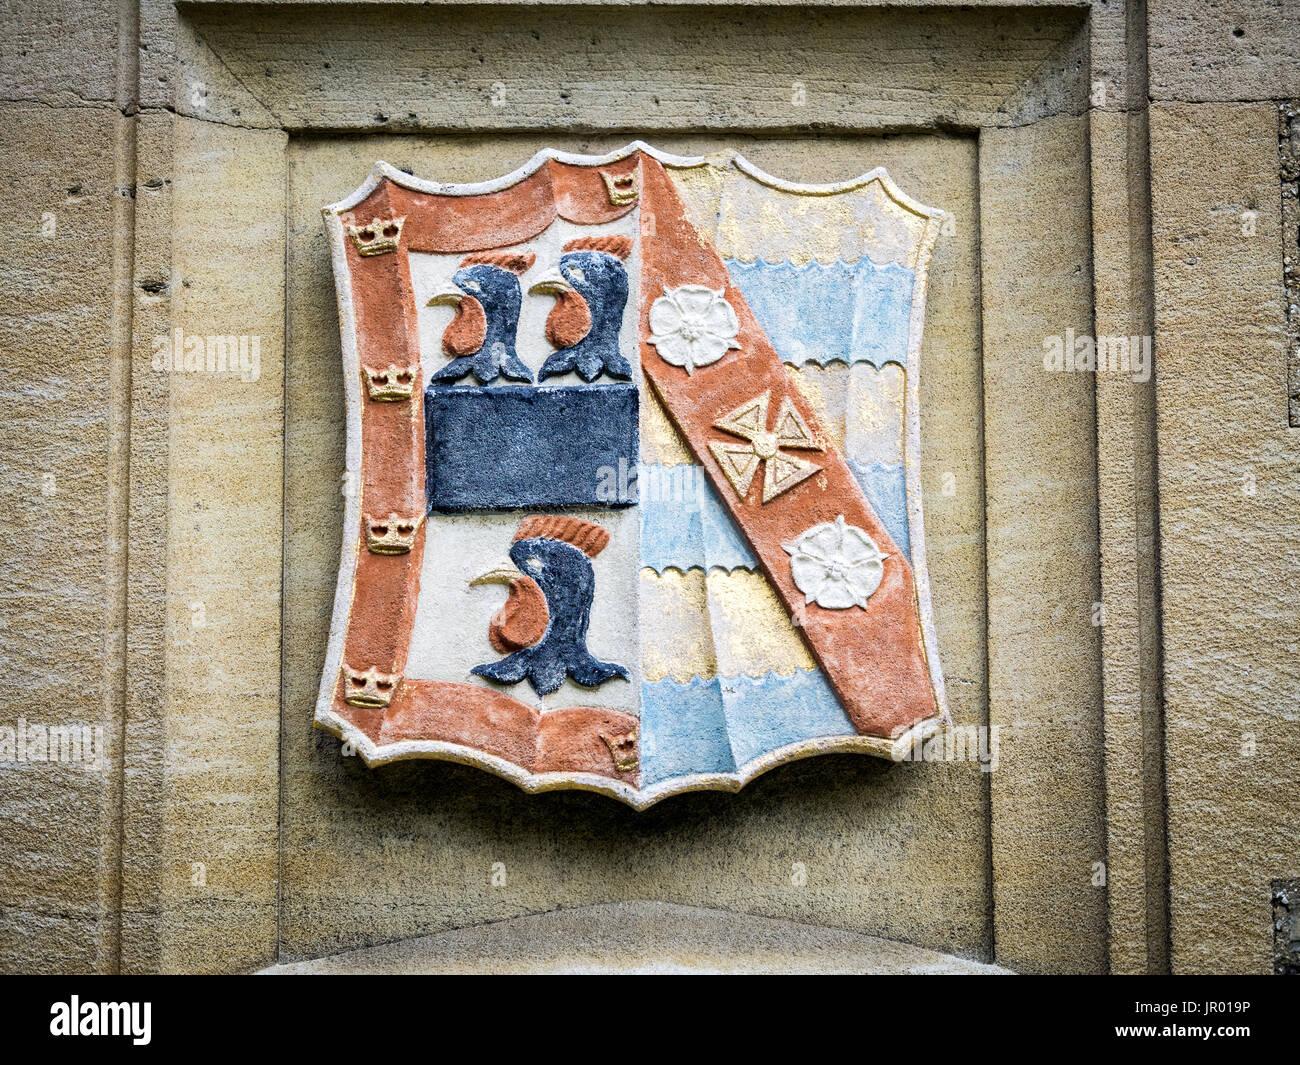 Jesus College Cambridge - Coat of Arms of Jesus College, part of the University of Cambridge, UK - Stock Image